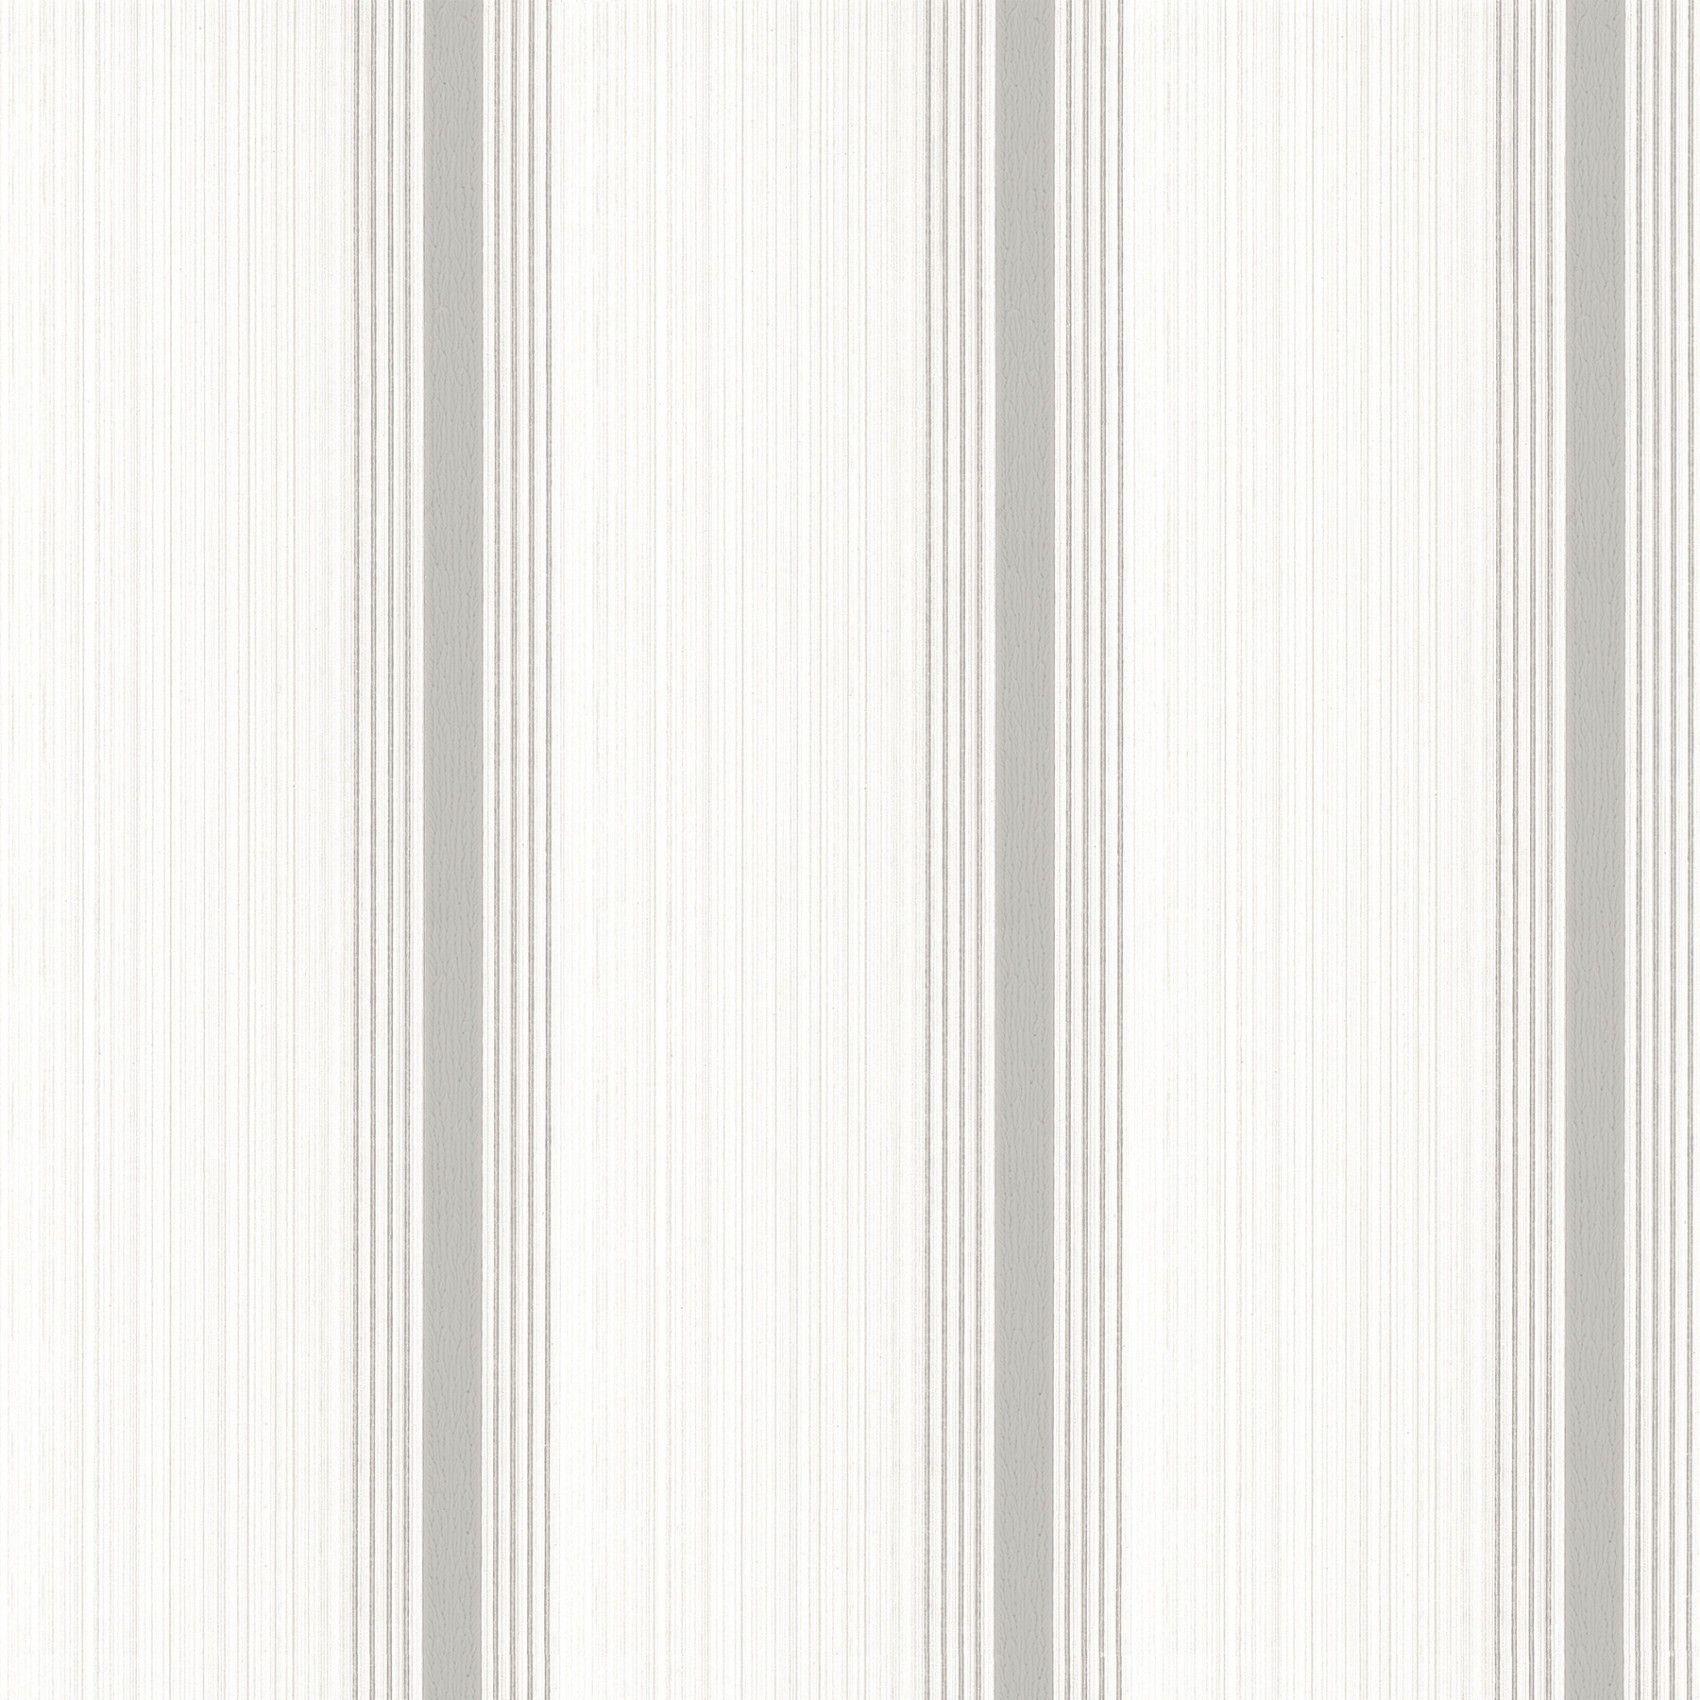 Cavendish Stripe Brush Stone Striped wallpaper